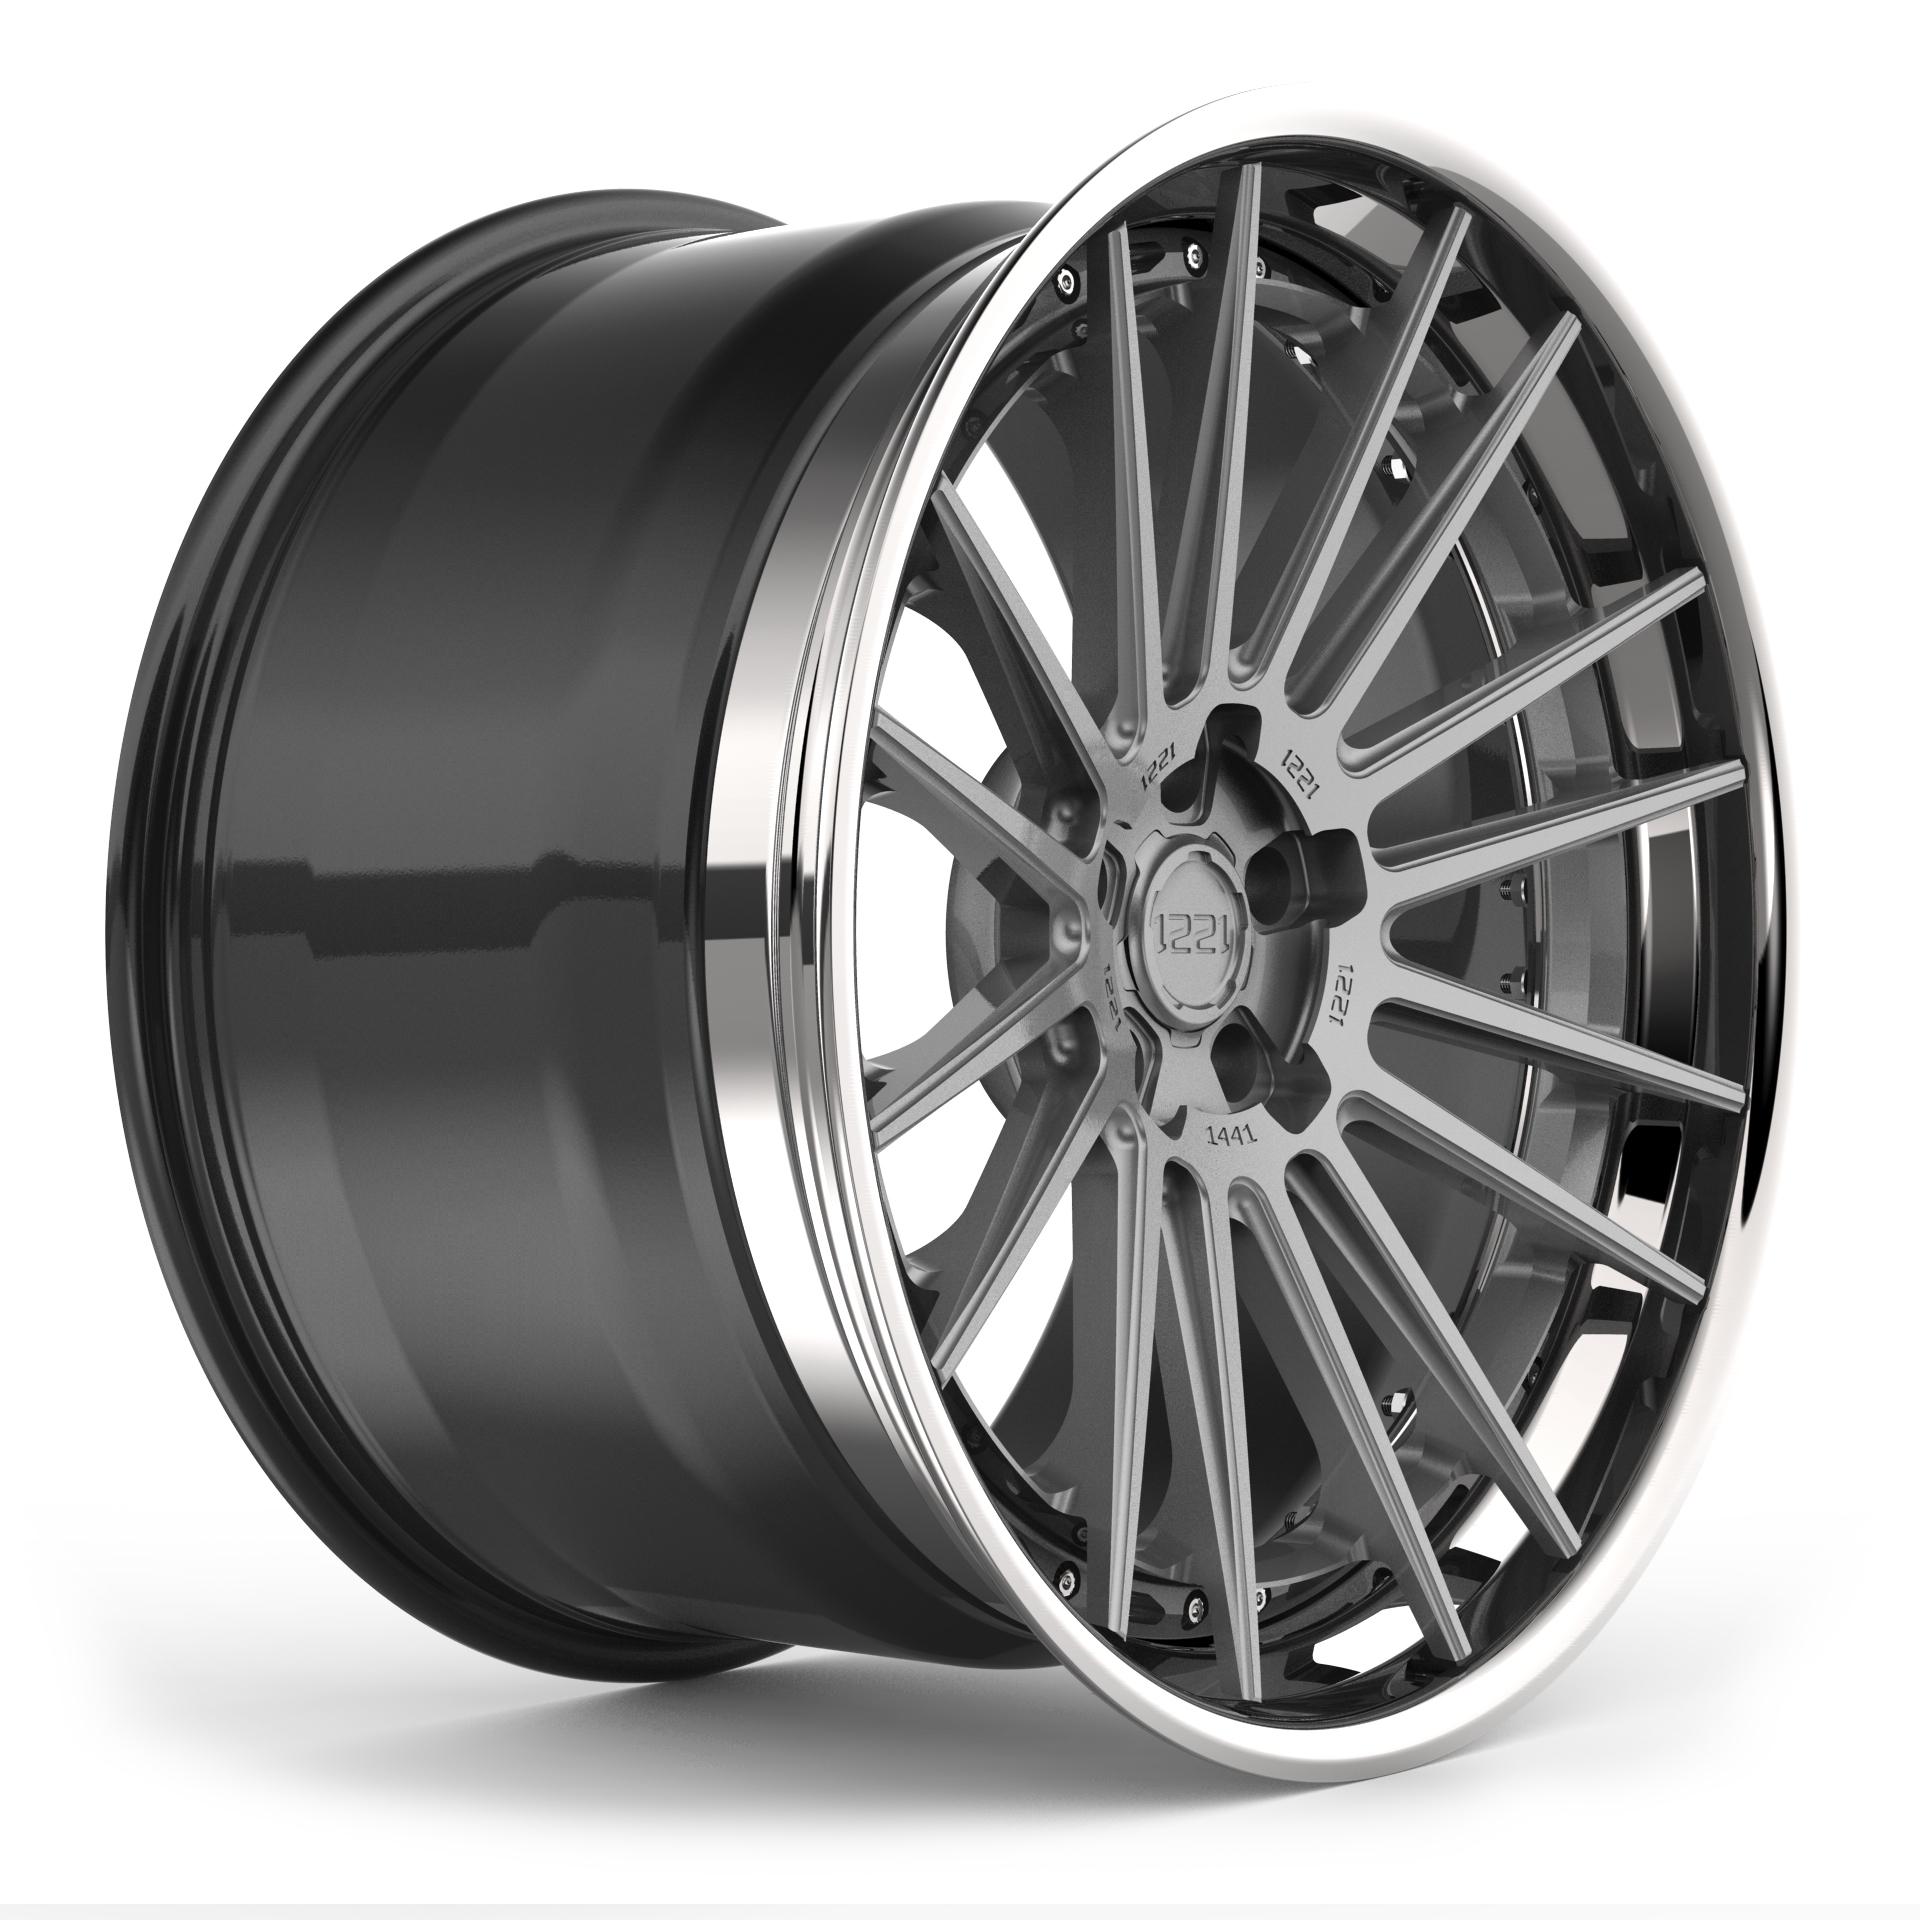 1221 Wheels 1441 AP3LX APEX3.0 forged wheels